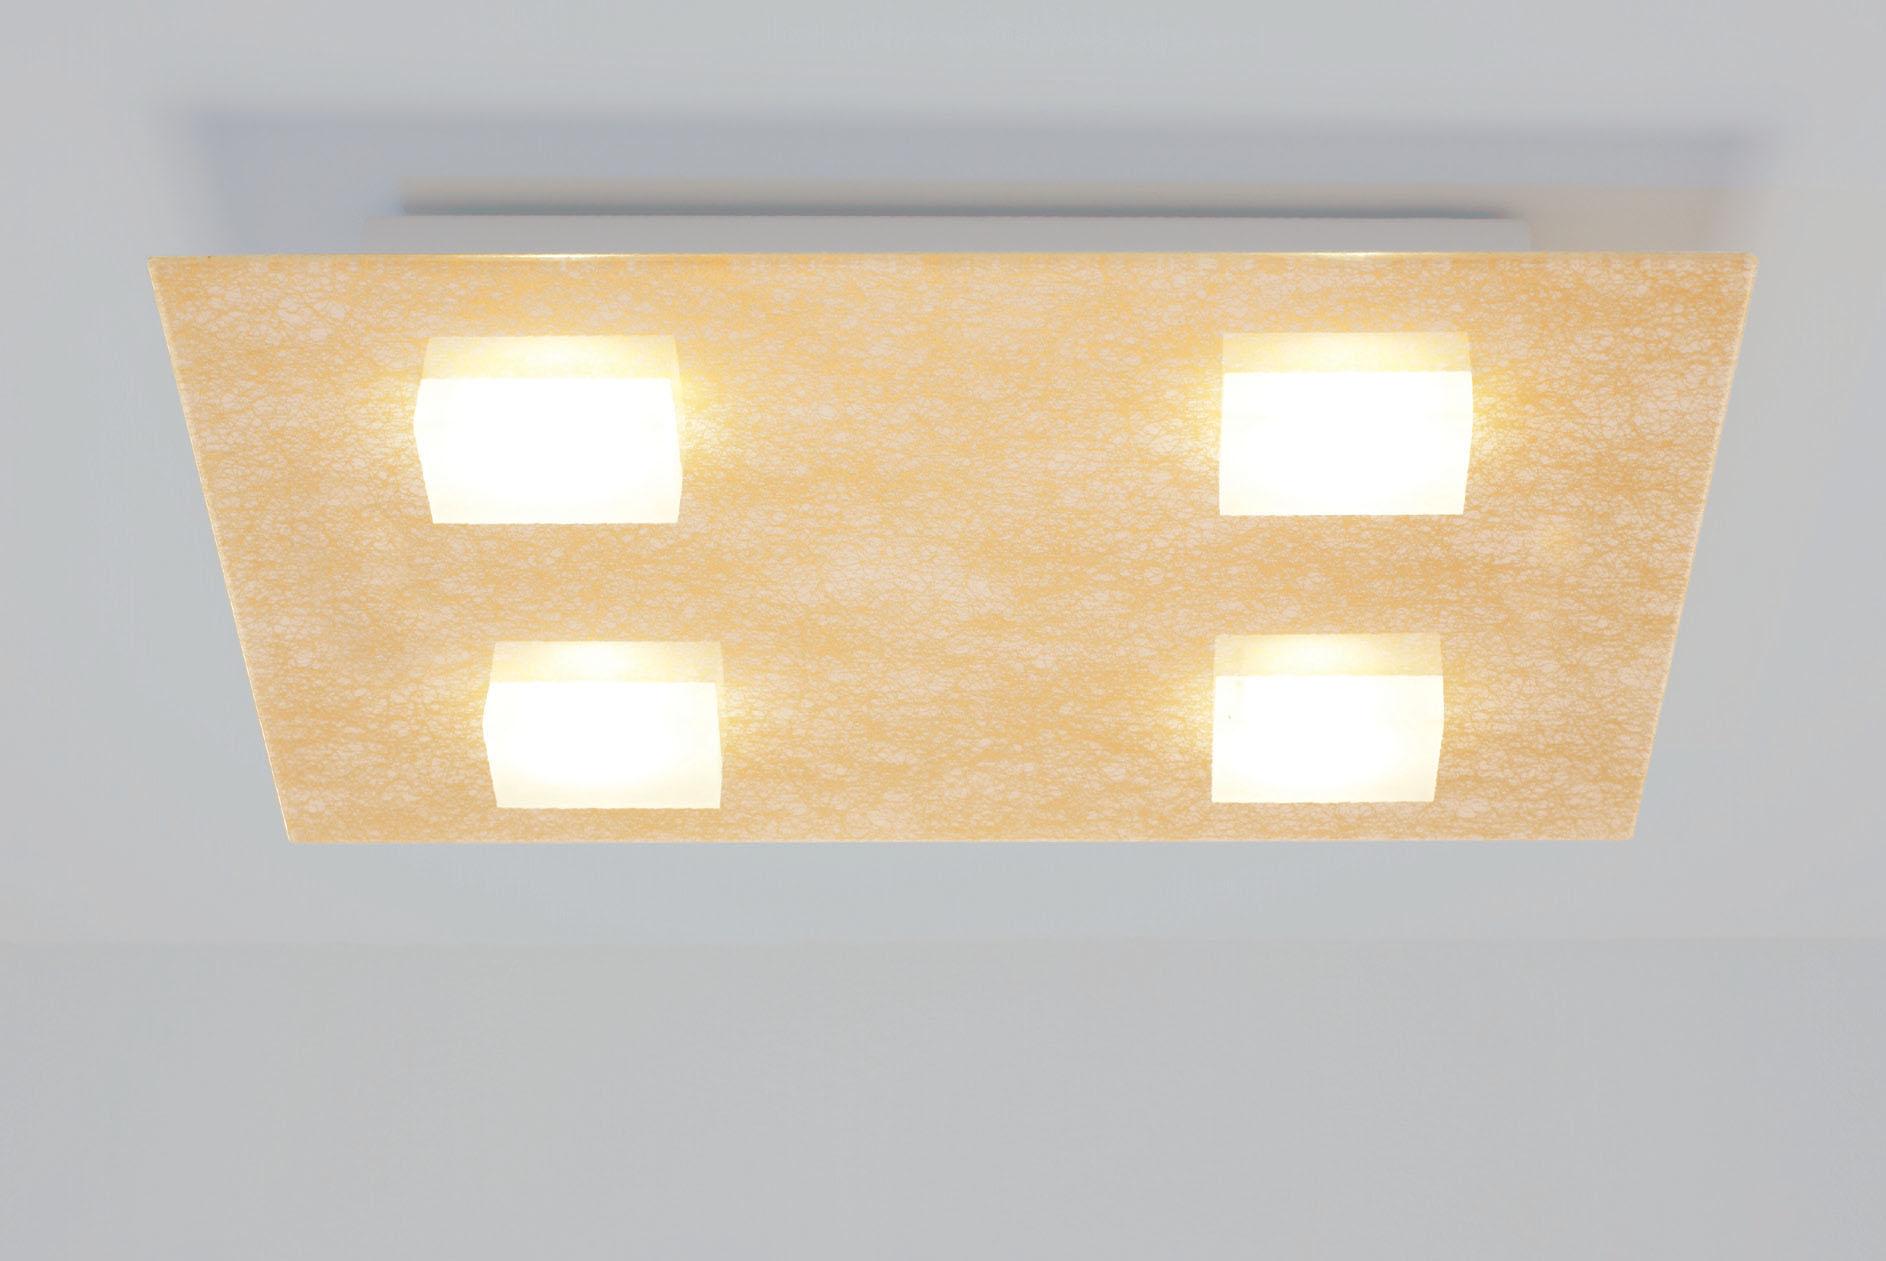 Plafoniere In Vetro Per Lampadari : Carino lampadari bagno lampadario soffitto plafoniera moderna